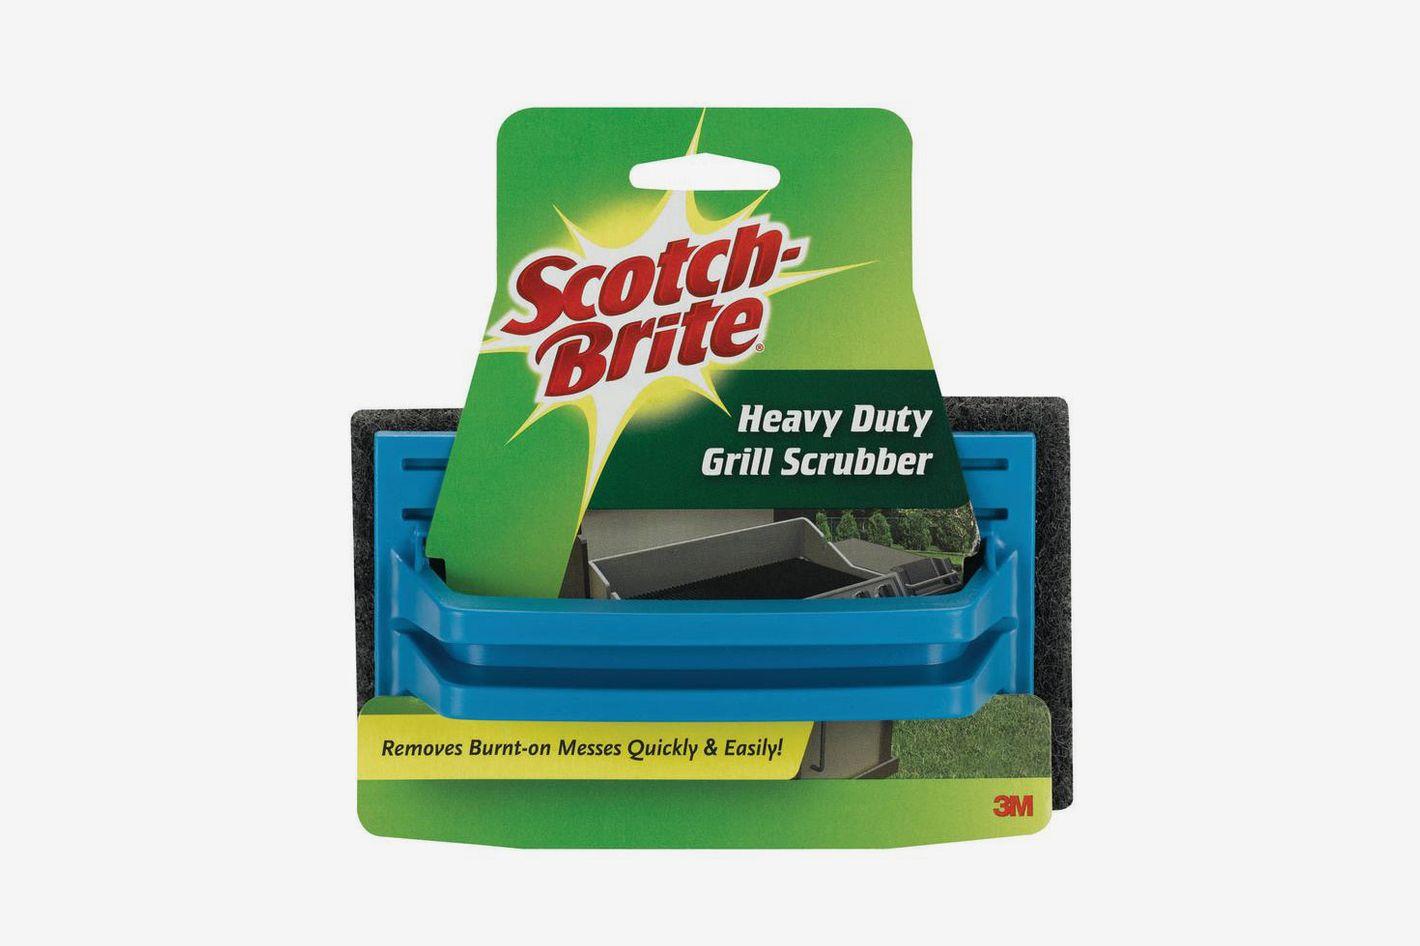 Scotch-Brite 7721 Grill Scrub, 6 in L x 4 in W, Synthetic Fiber, Brown